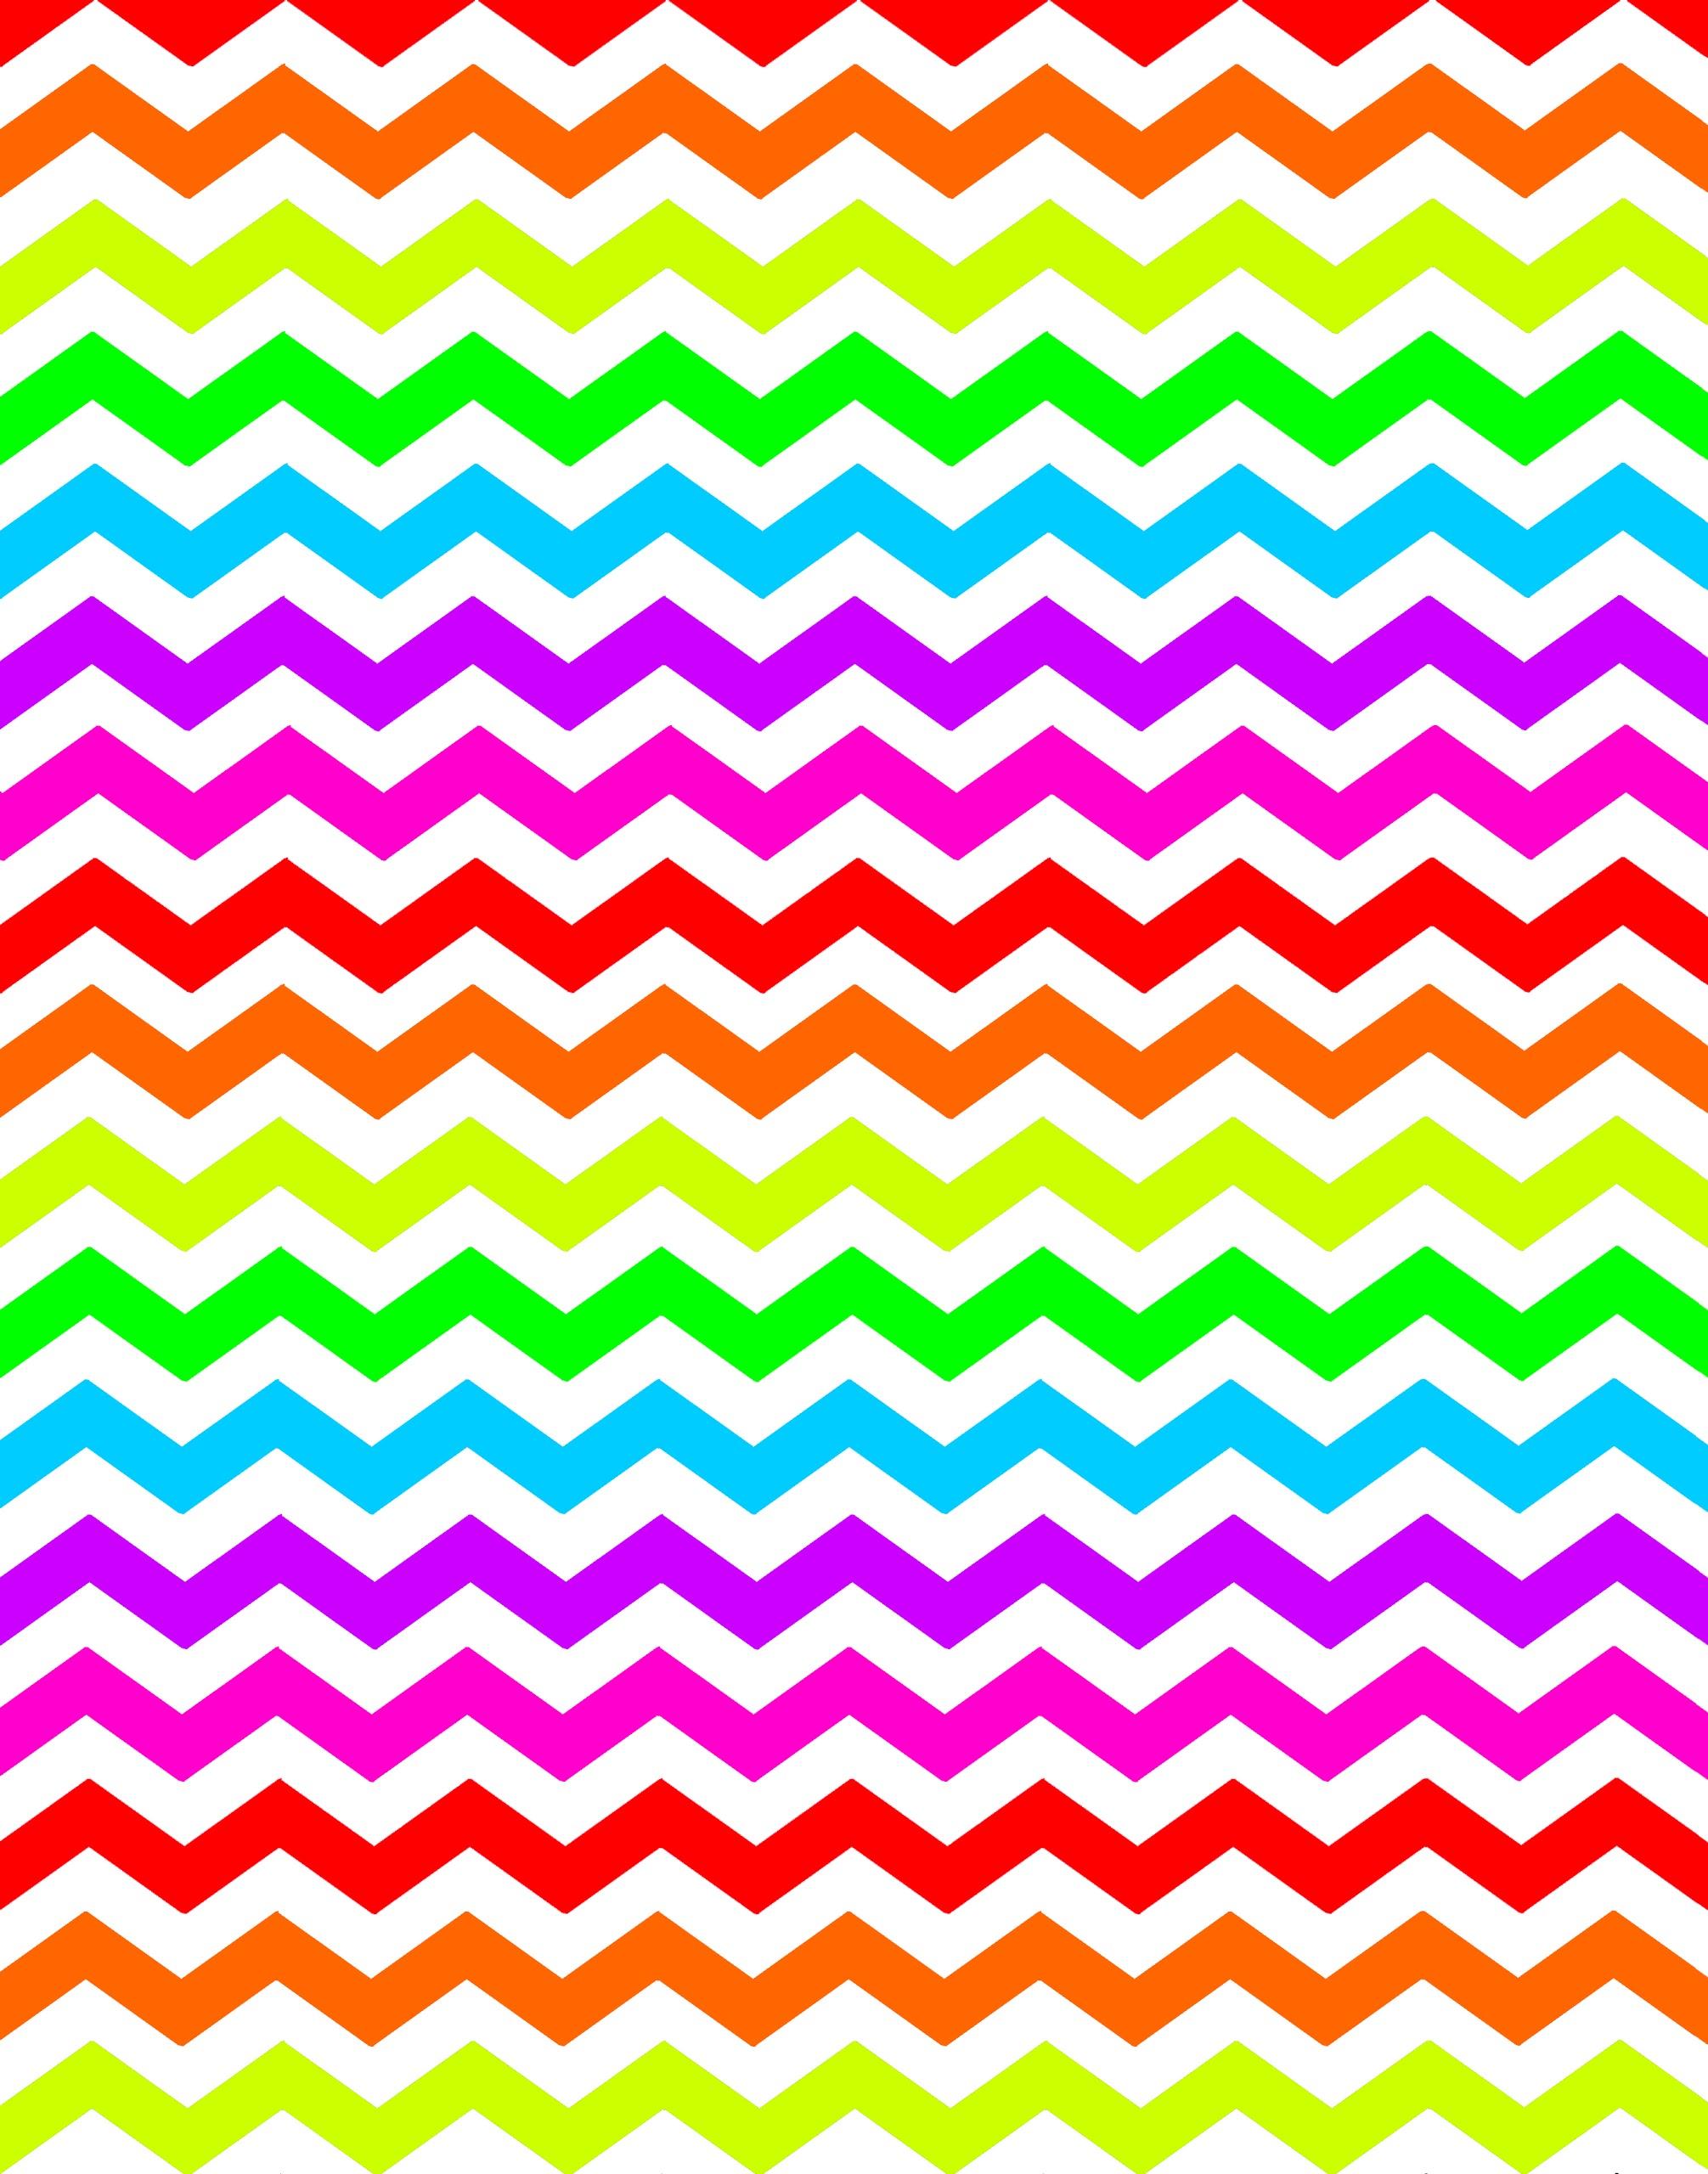 Colorful Cheetah Print Wallpaper   ClipArt Best 2011x2560